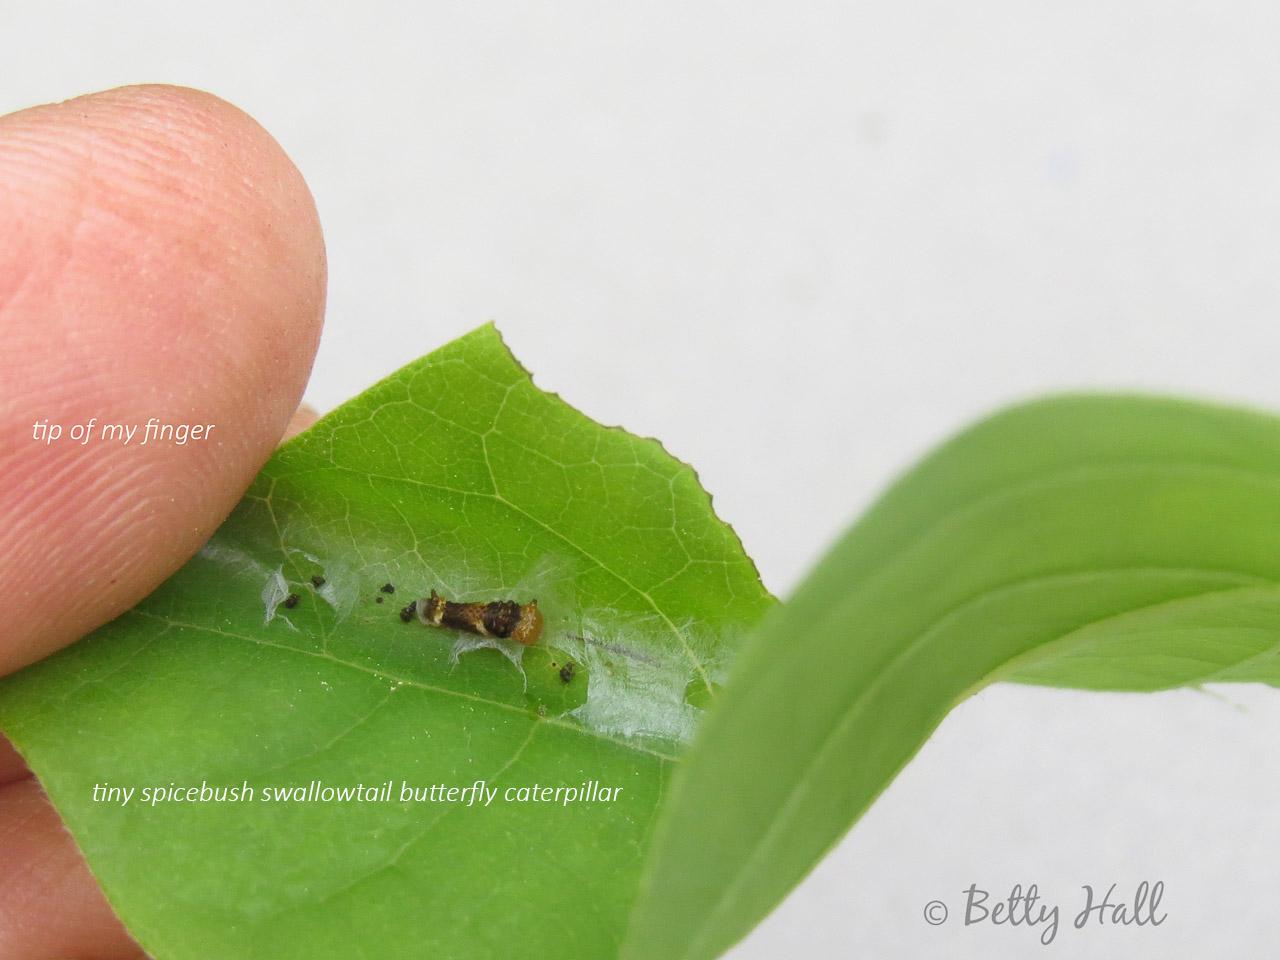 tiny spicebush swallowtail butterfly caterpillar